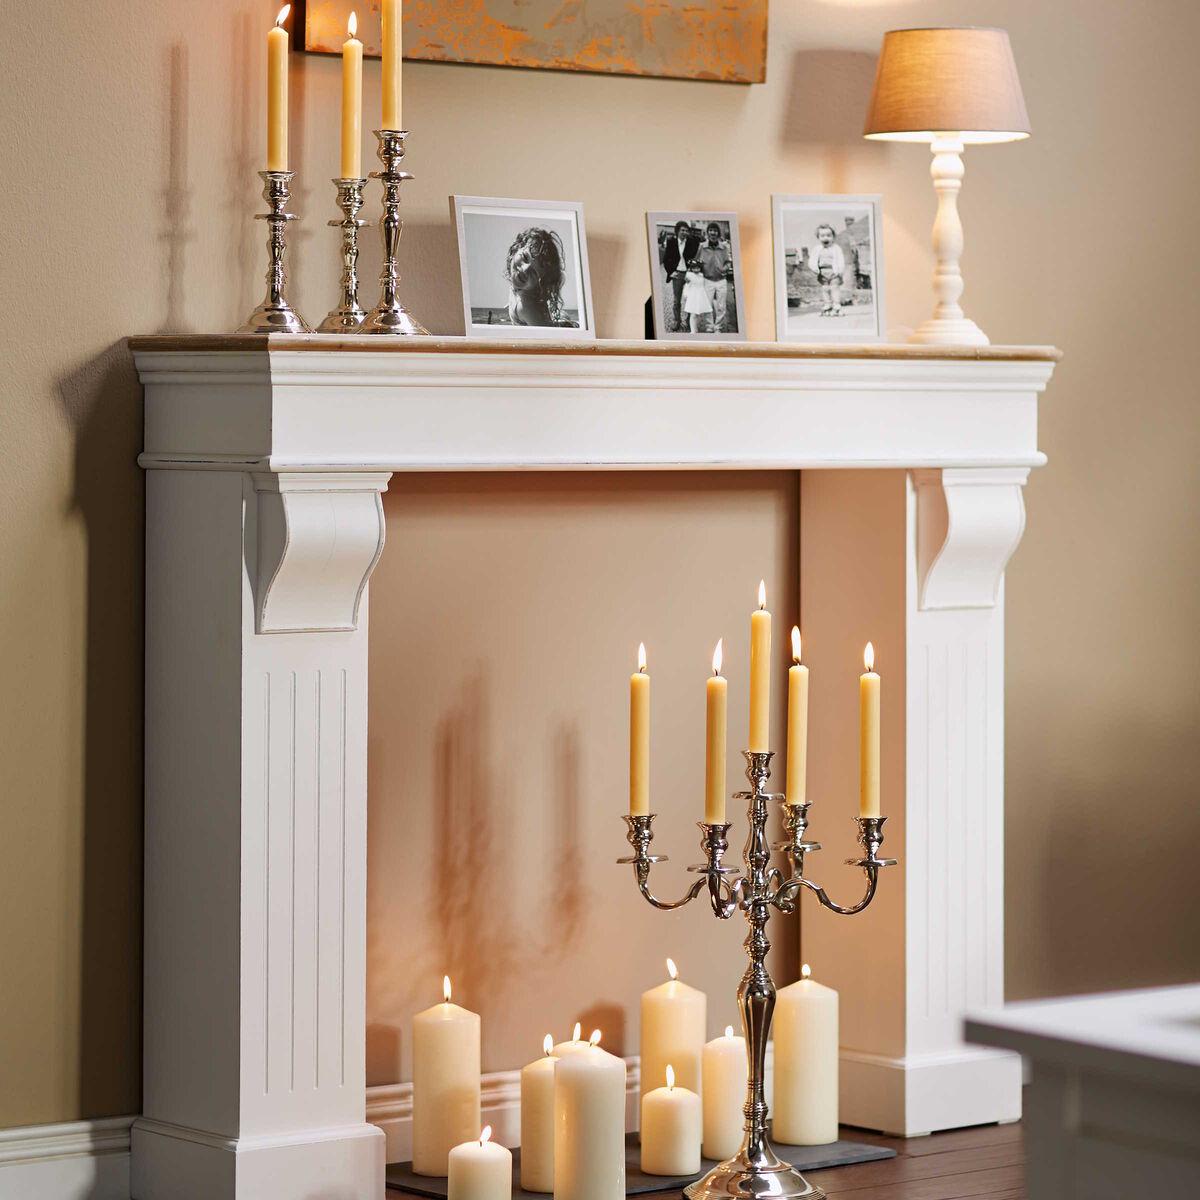 masterpiece kaminumrandung butlers. Black Bedroom Furniture Sets. Home Design Ideas